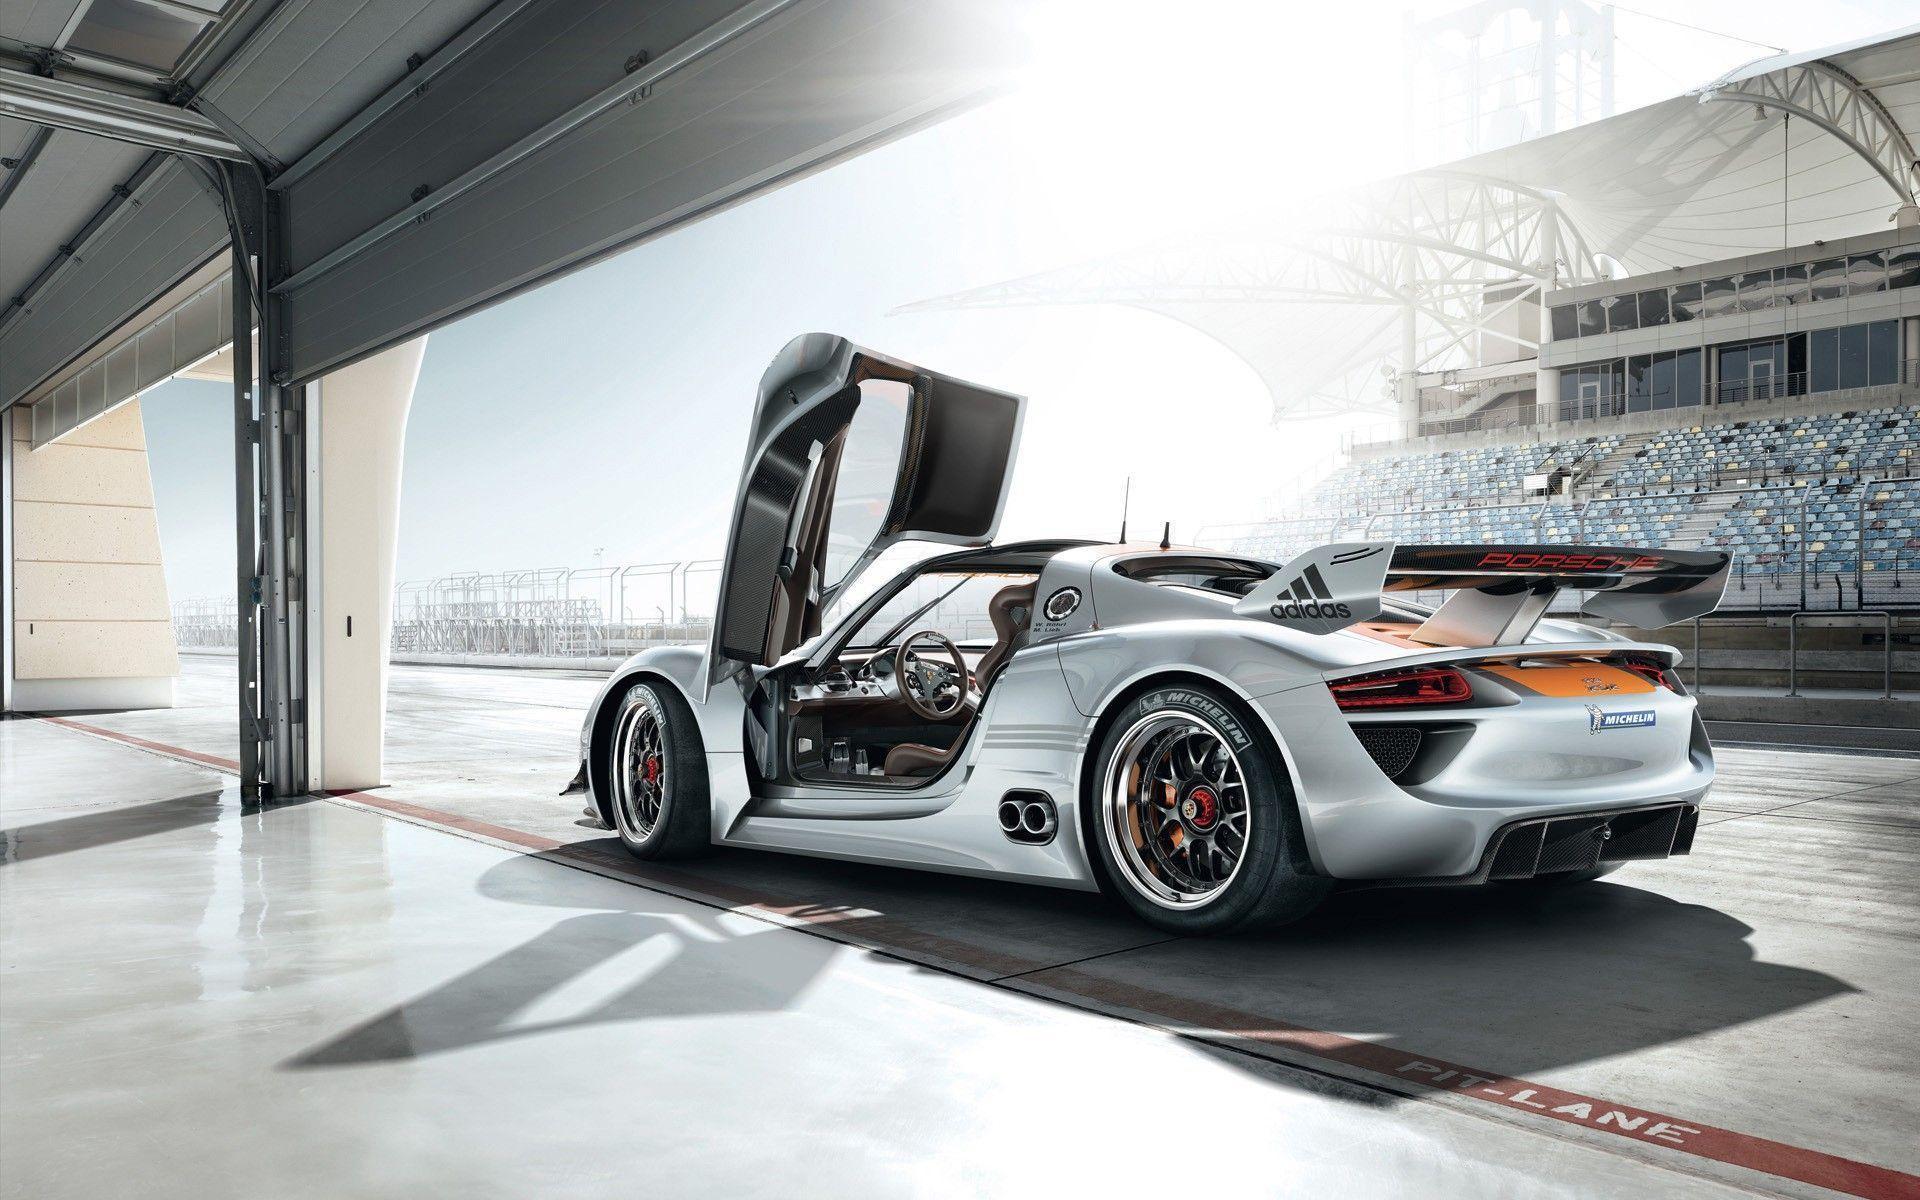 porsche super car wallpapers hd wallpapers - Super Cool Cars Wallpapers Hd